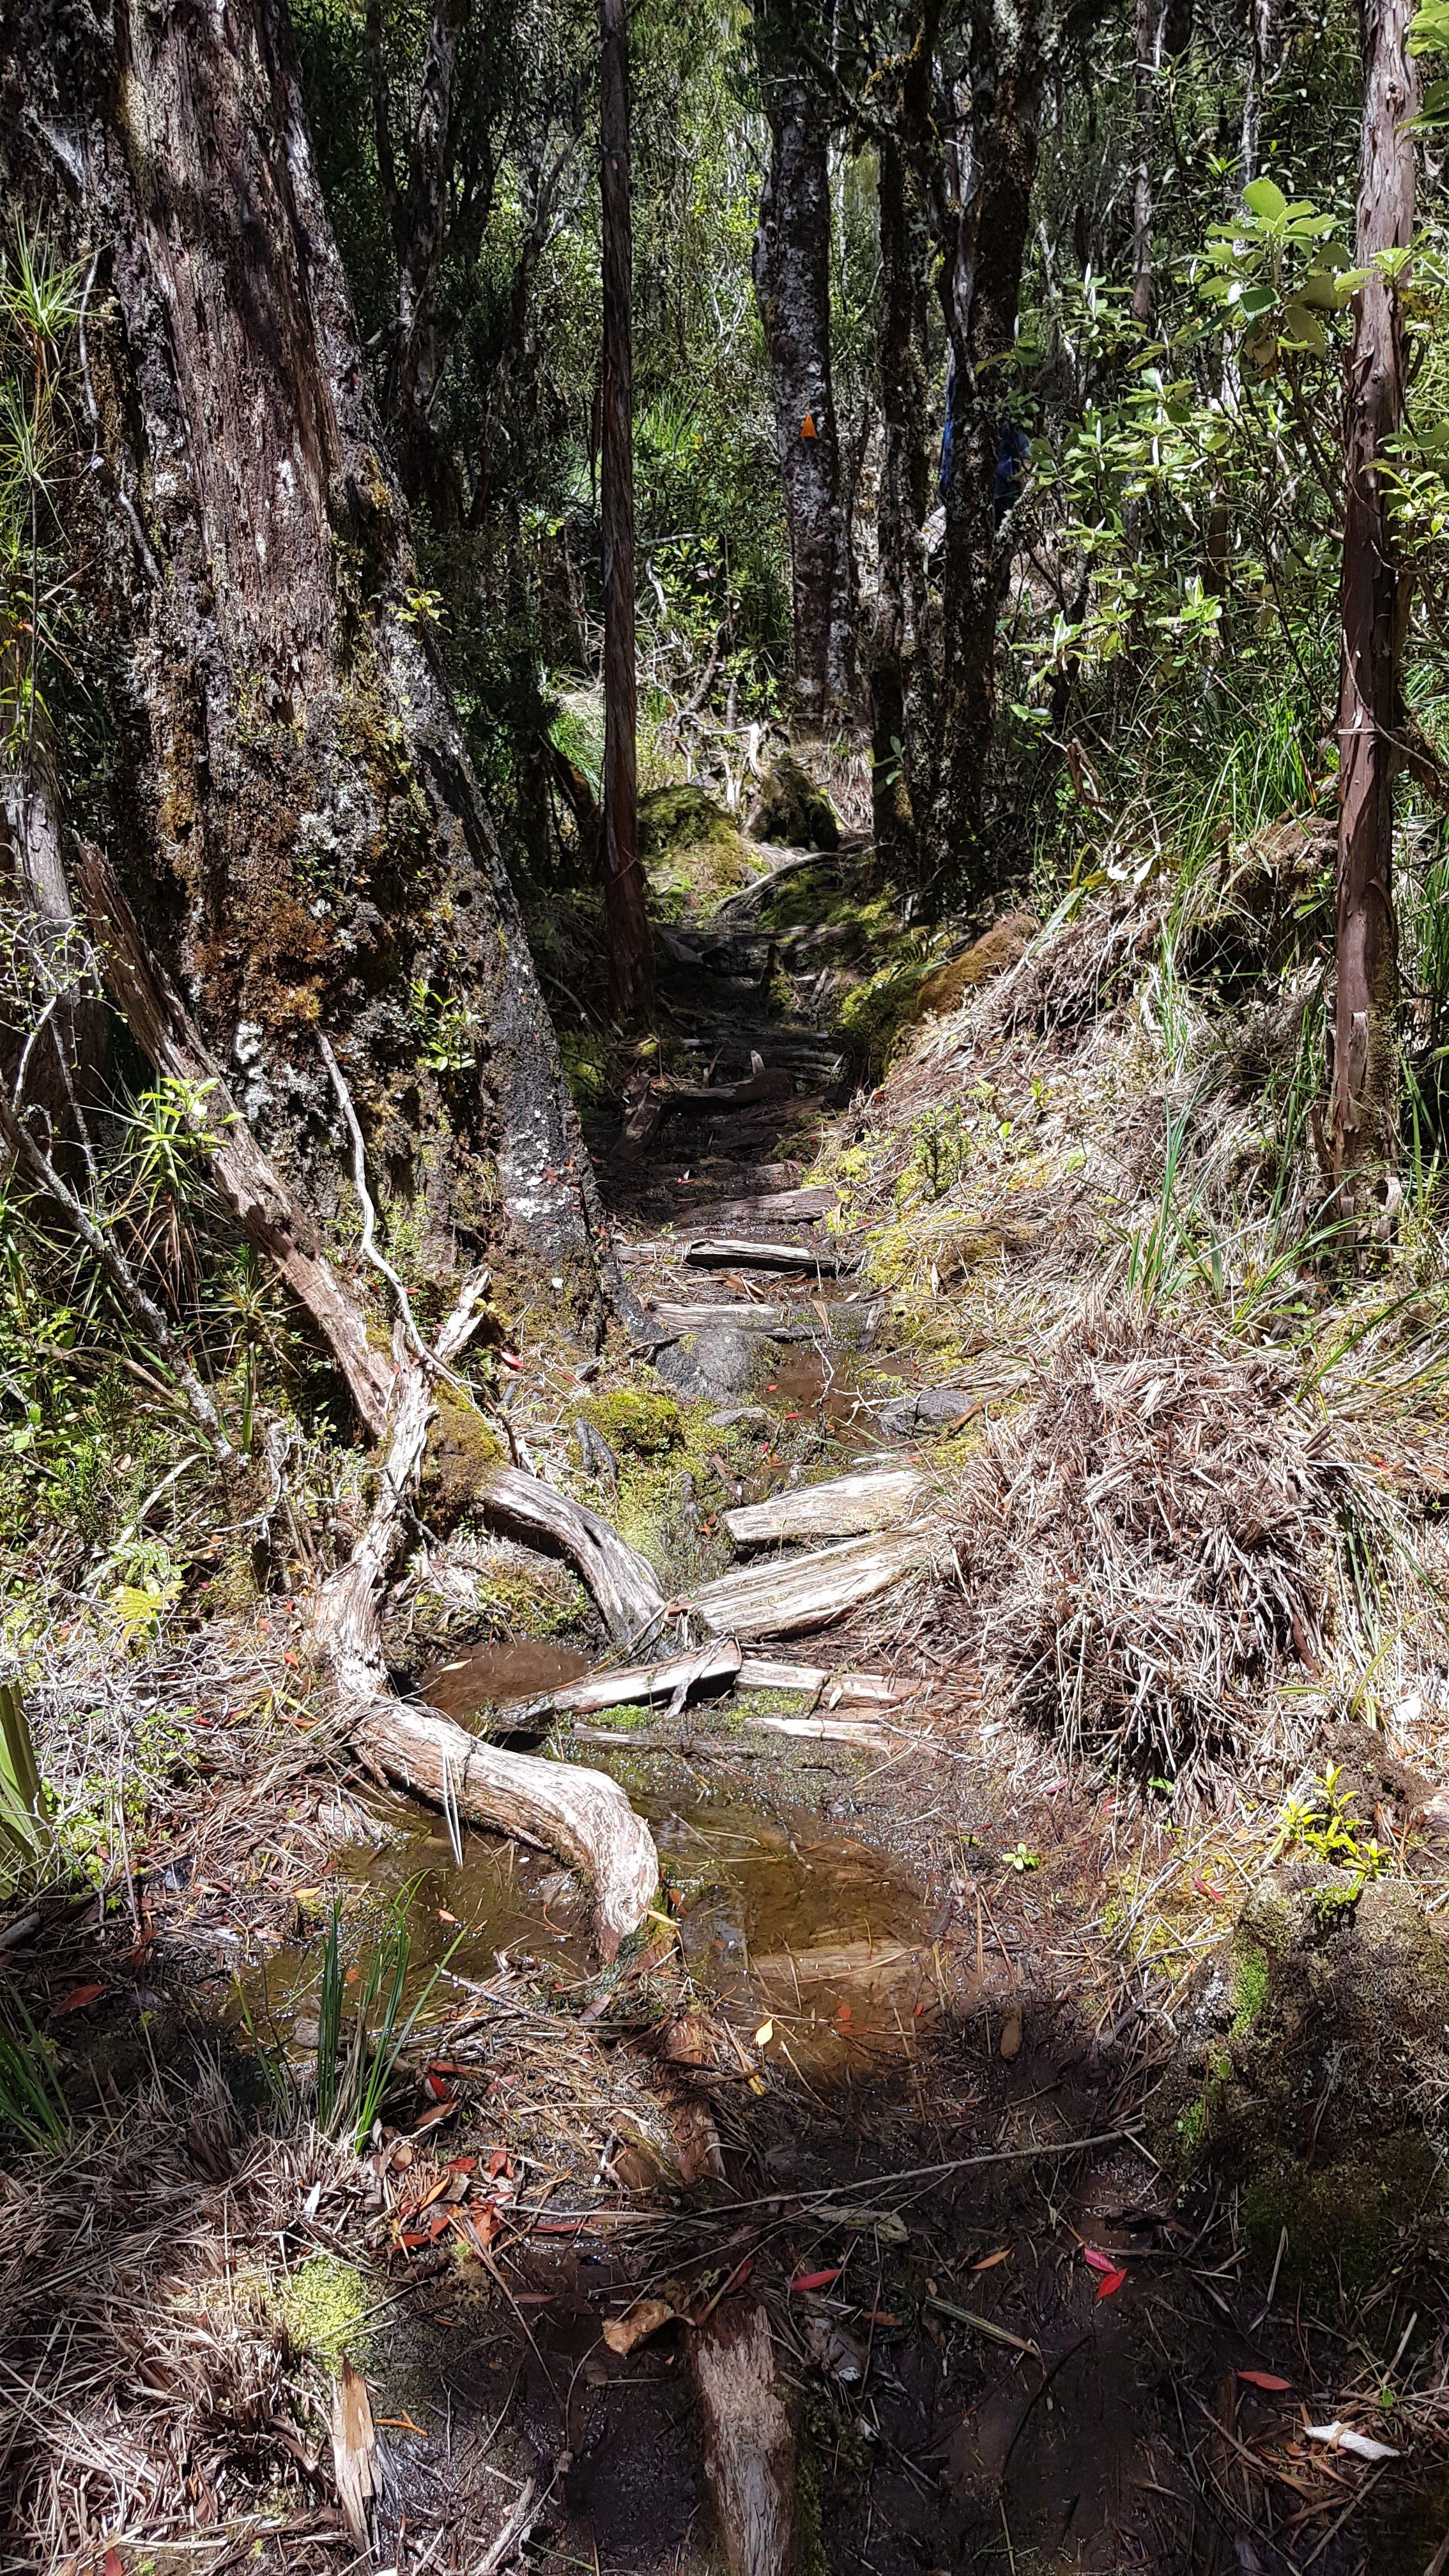 Muddy - after Camp Creek hut